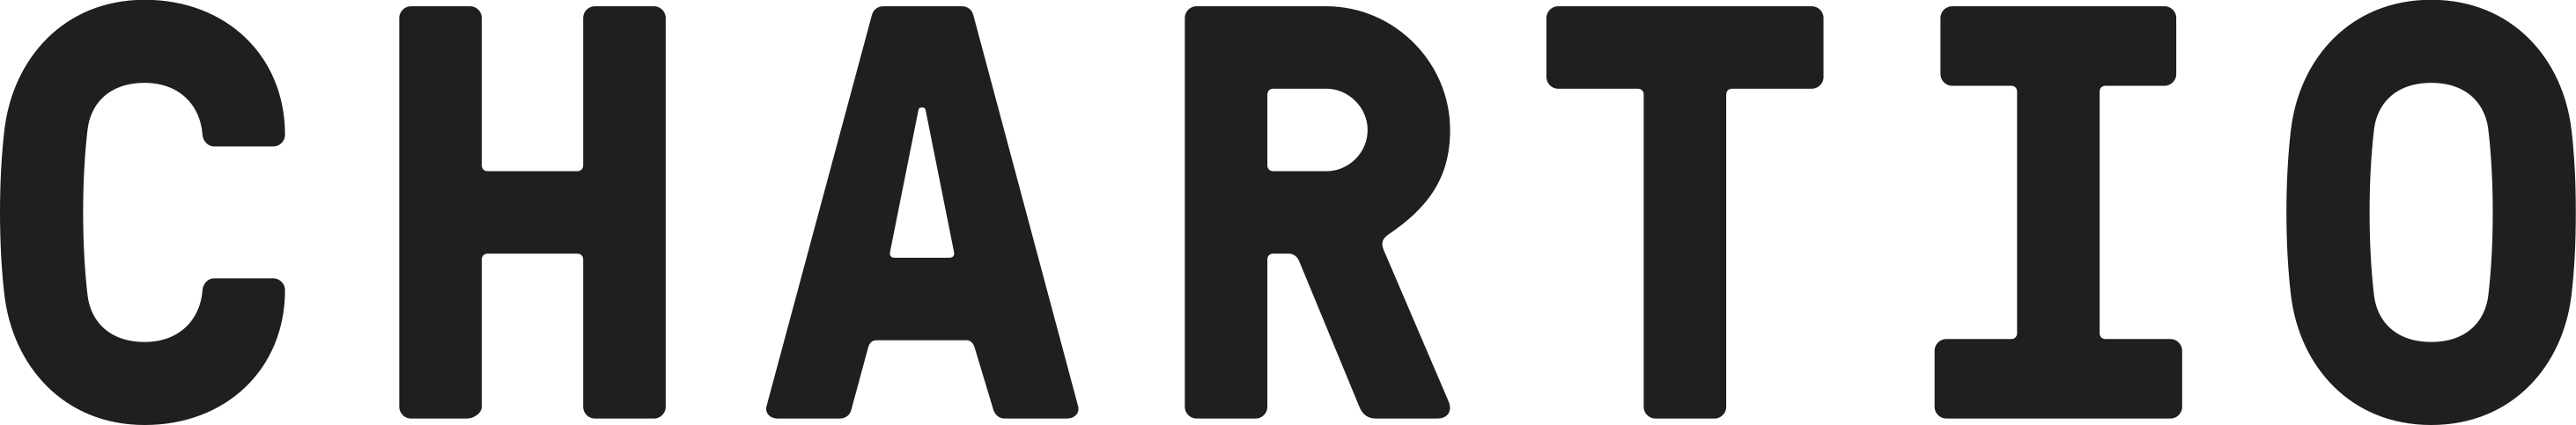 Amazon Redshift Logo Chartio-logo